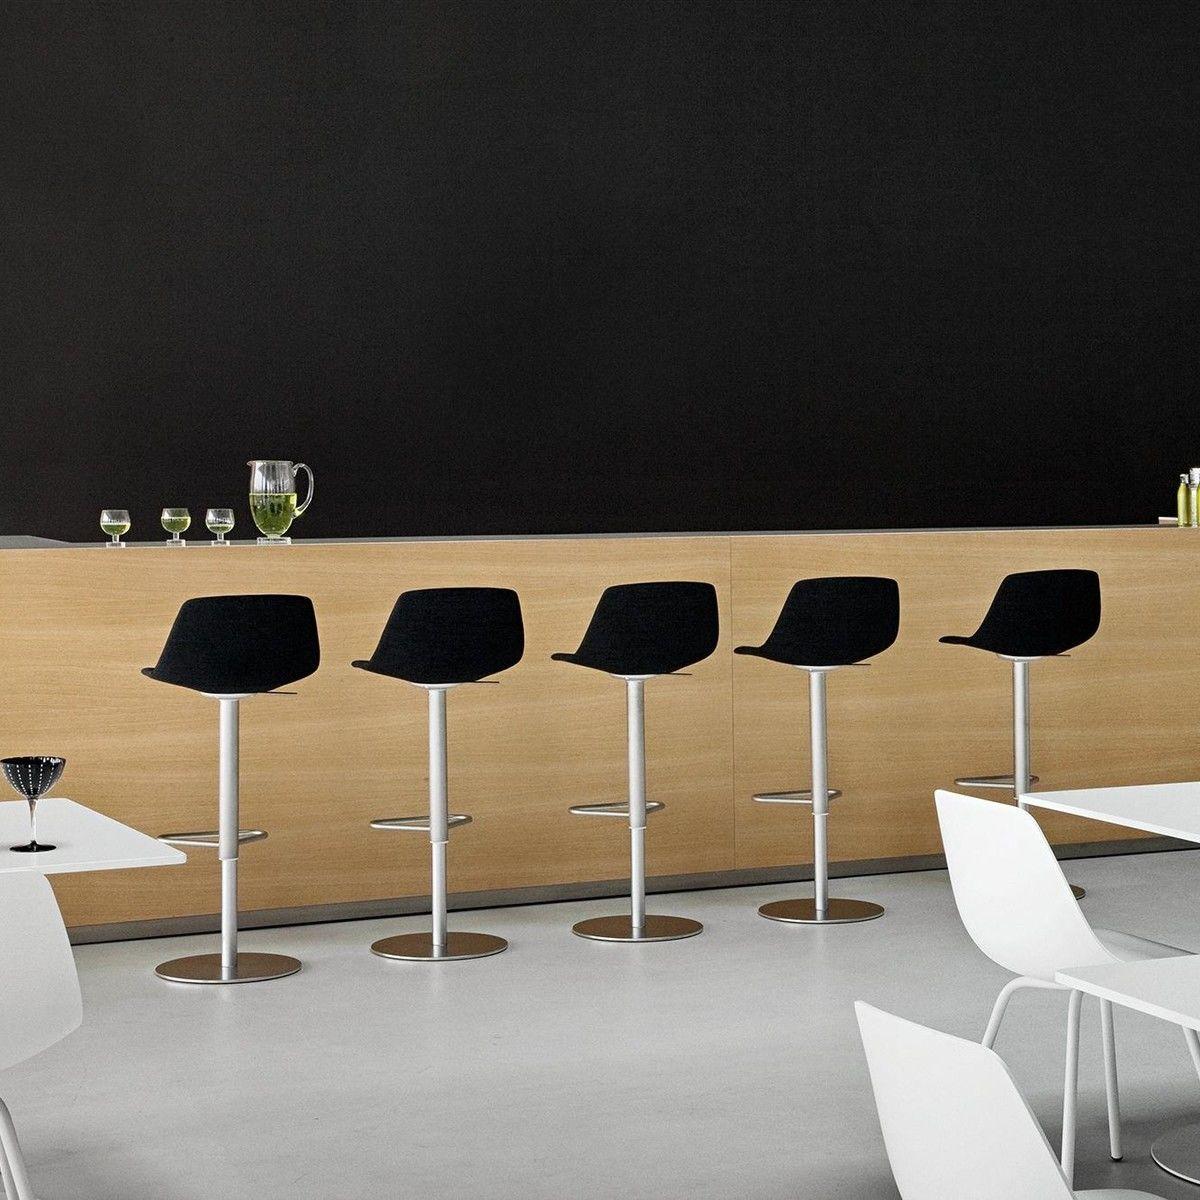 miunn tabouret de bar acier inox rond la palma tabourets de bar meubles d 39 assise. Black Bedroom Furniture Sets. Home Design Ideas